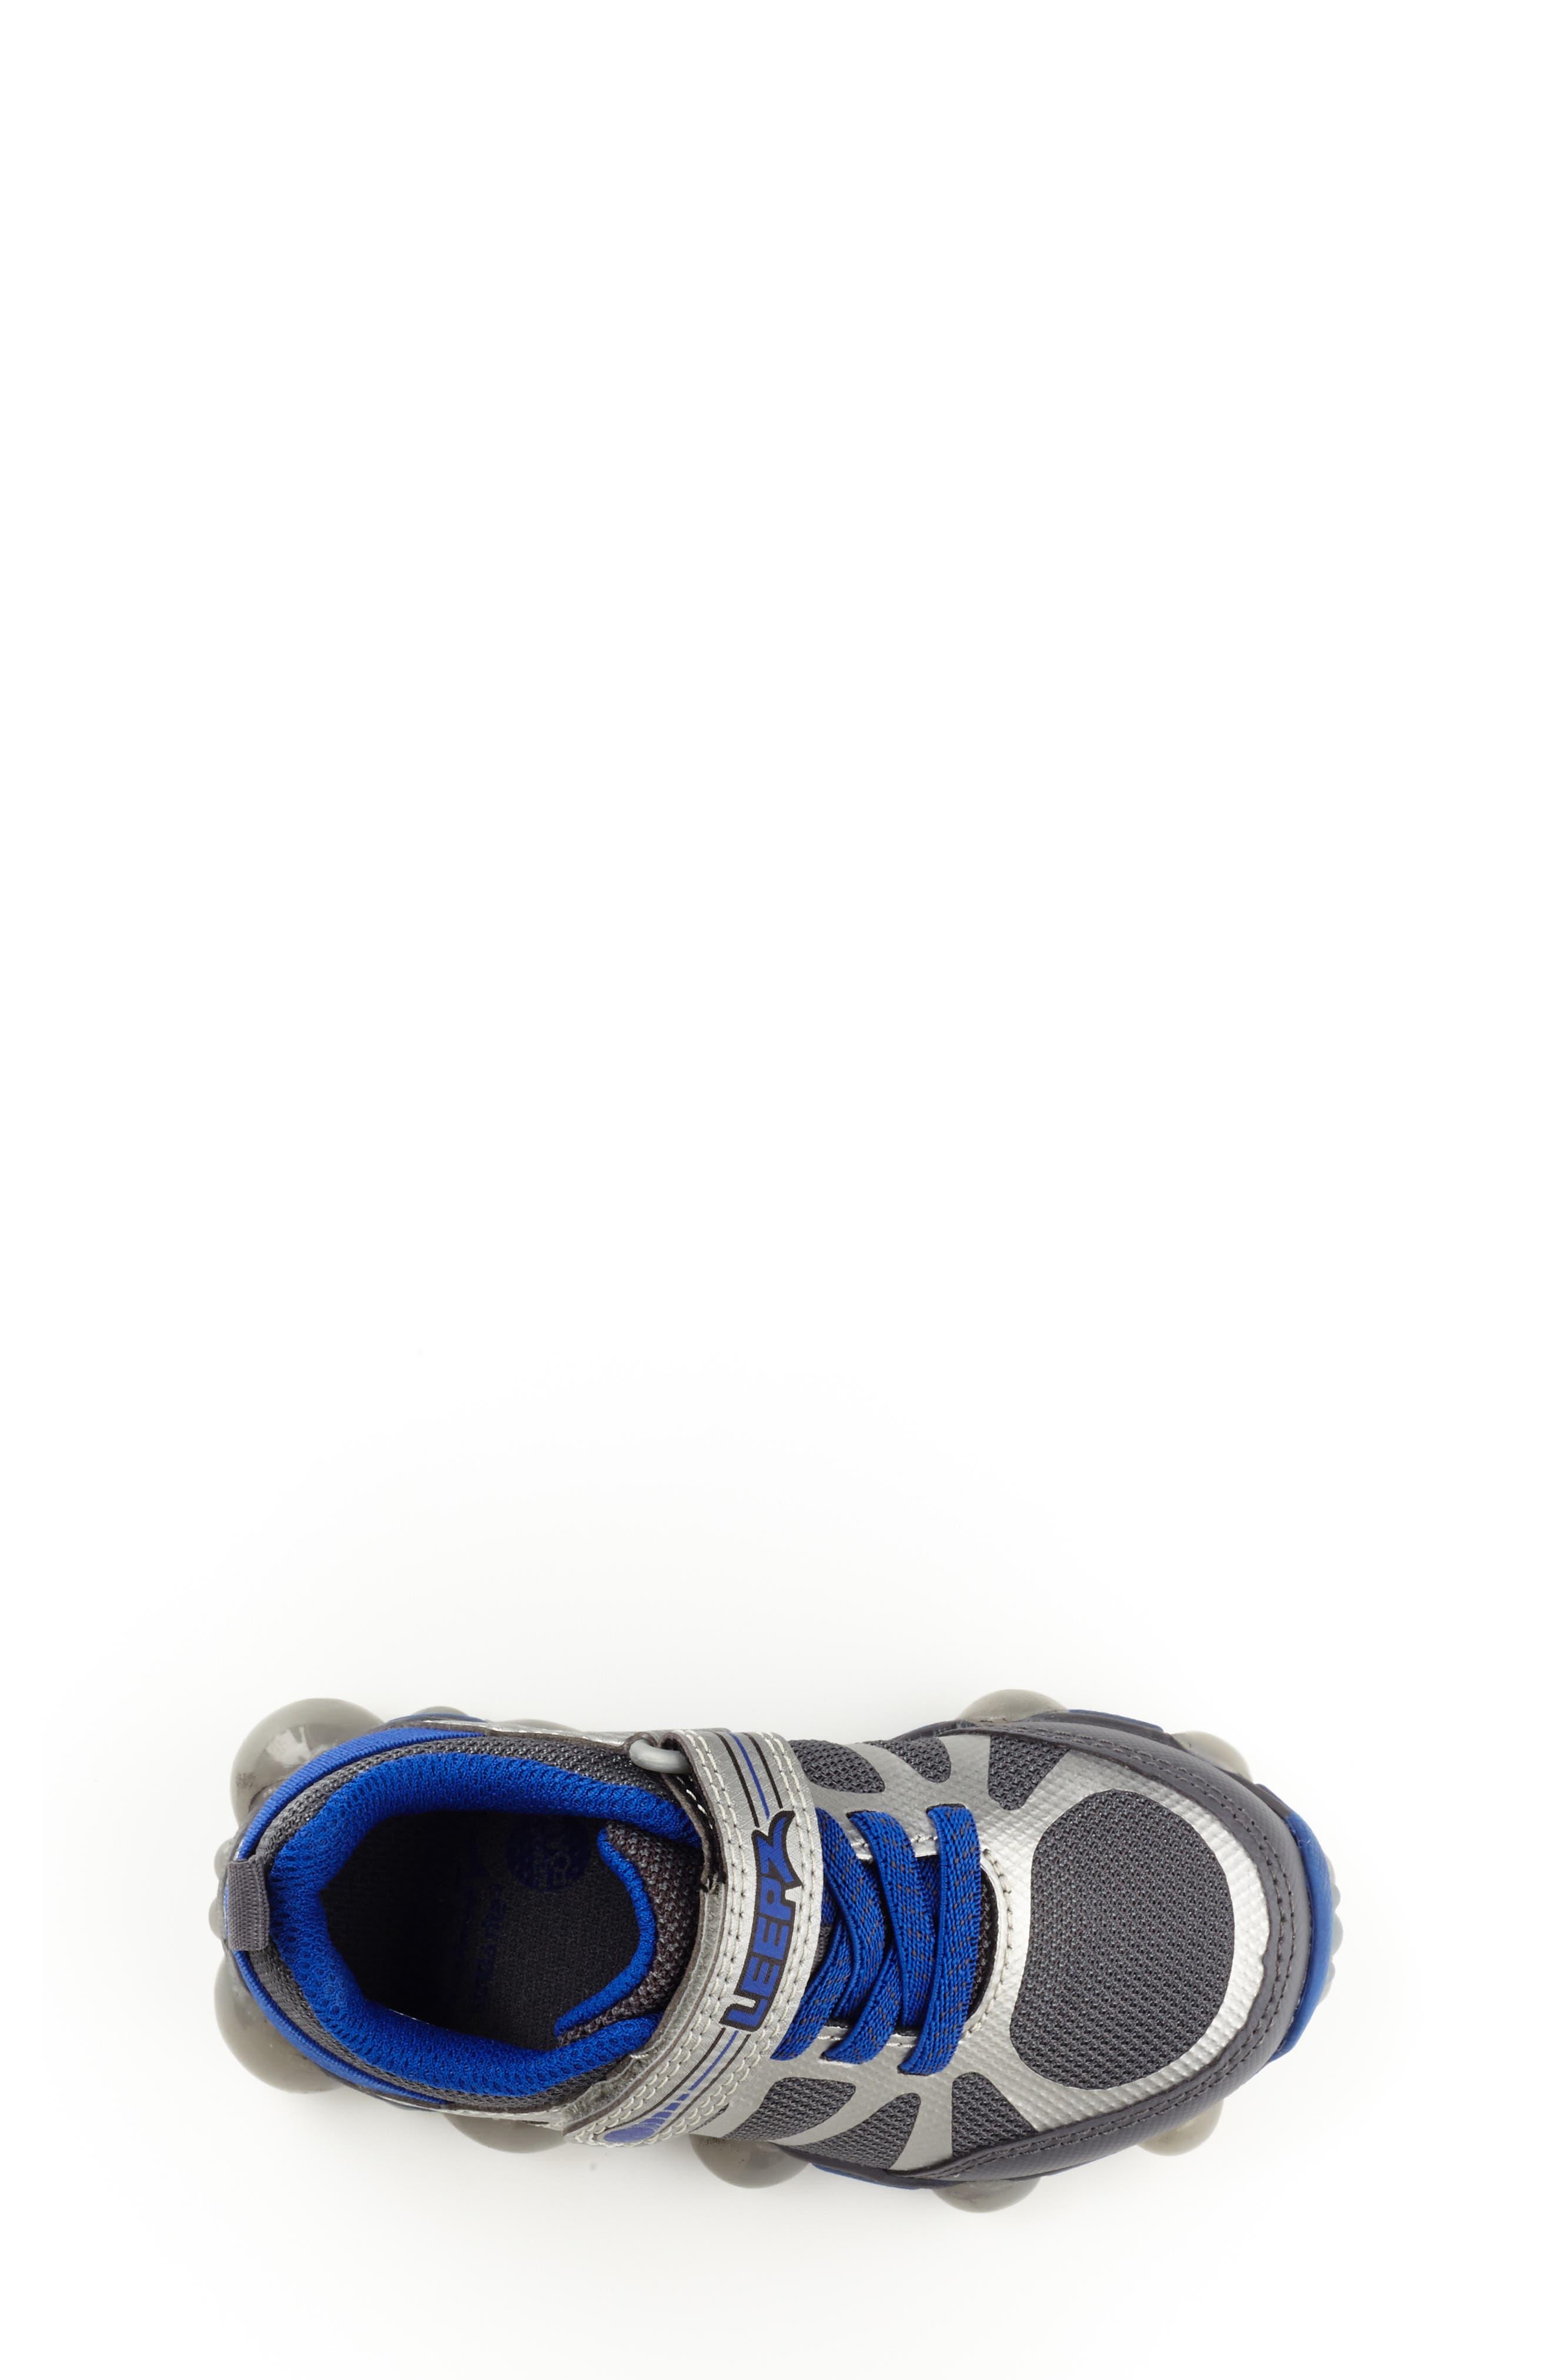 Leepz 3.0 Light-Up Sneaker,                             Alternate thumbnail 4, color,                             DARK GREY/ BLUE